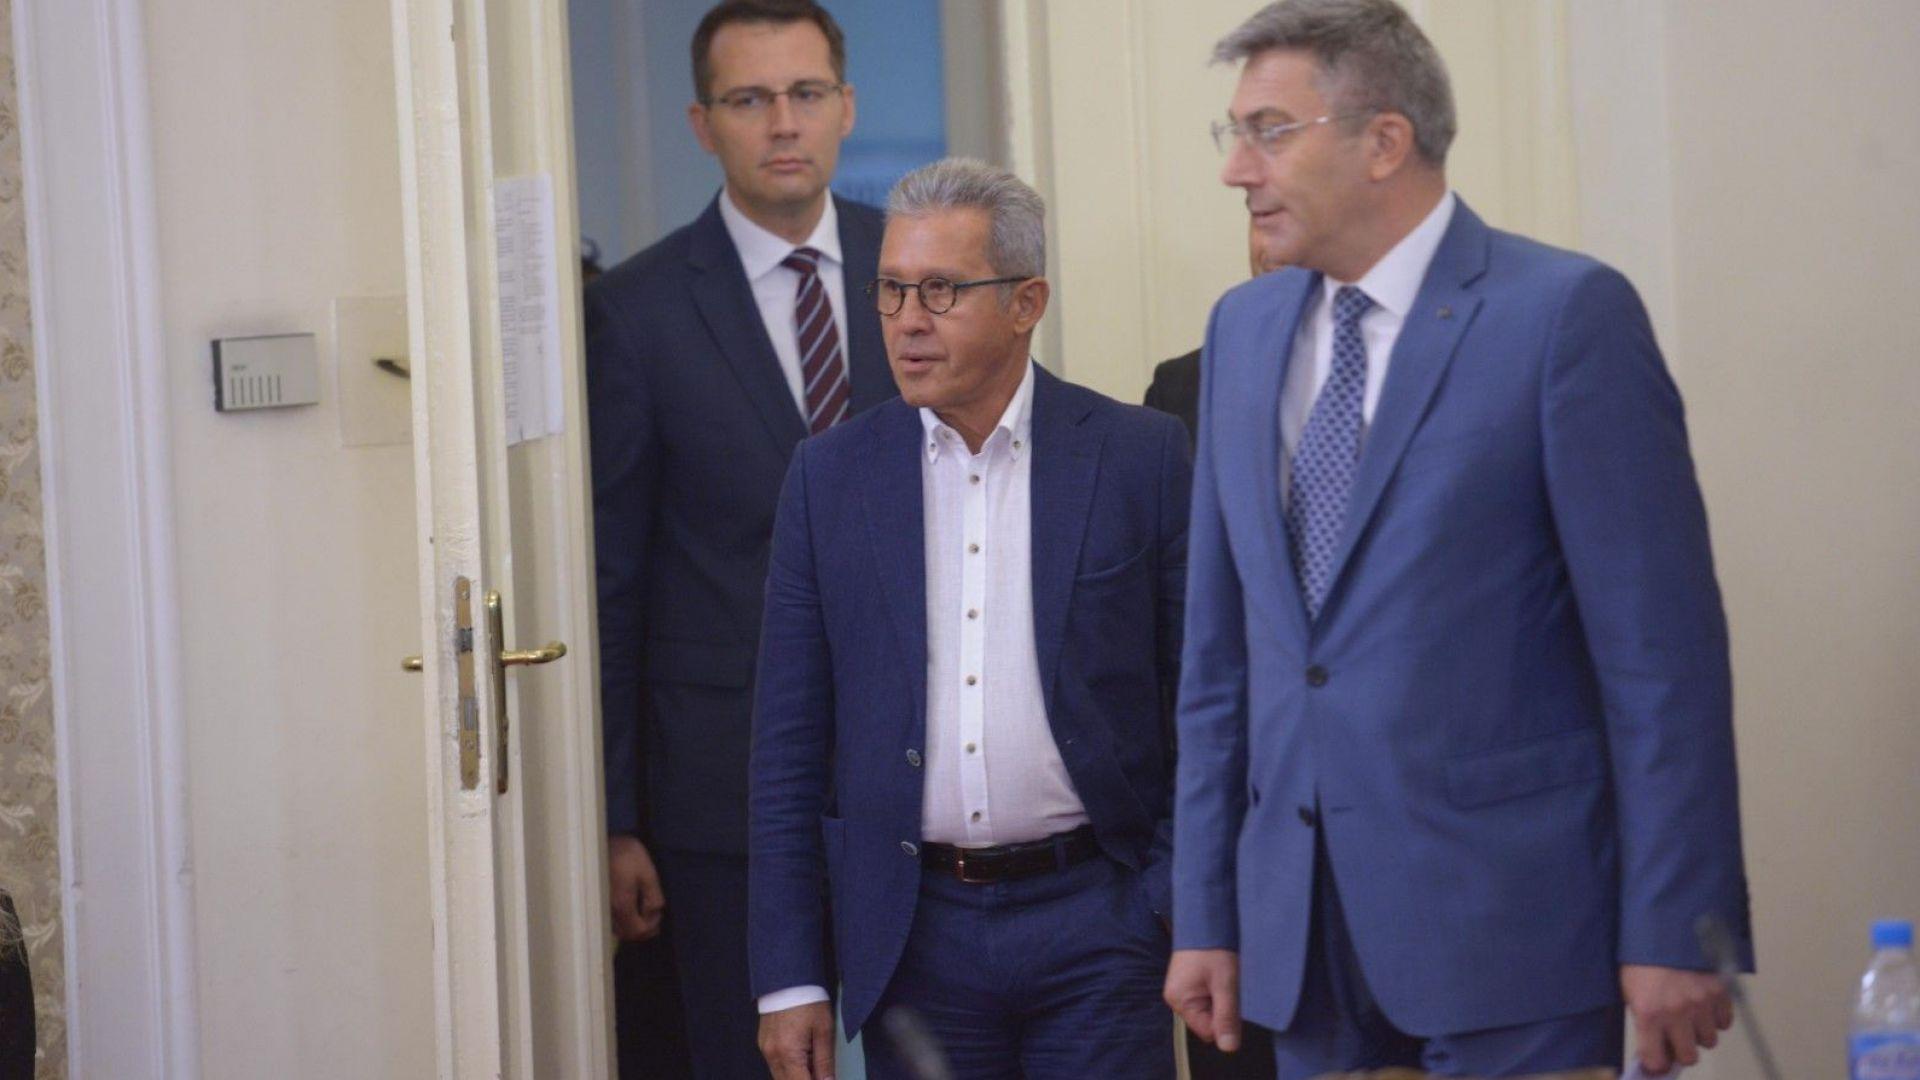 Йордан Цонев: Ние сме зрители в преговорите за кабинет, виждаме политическа немощ